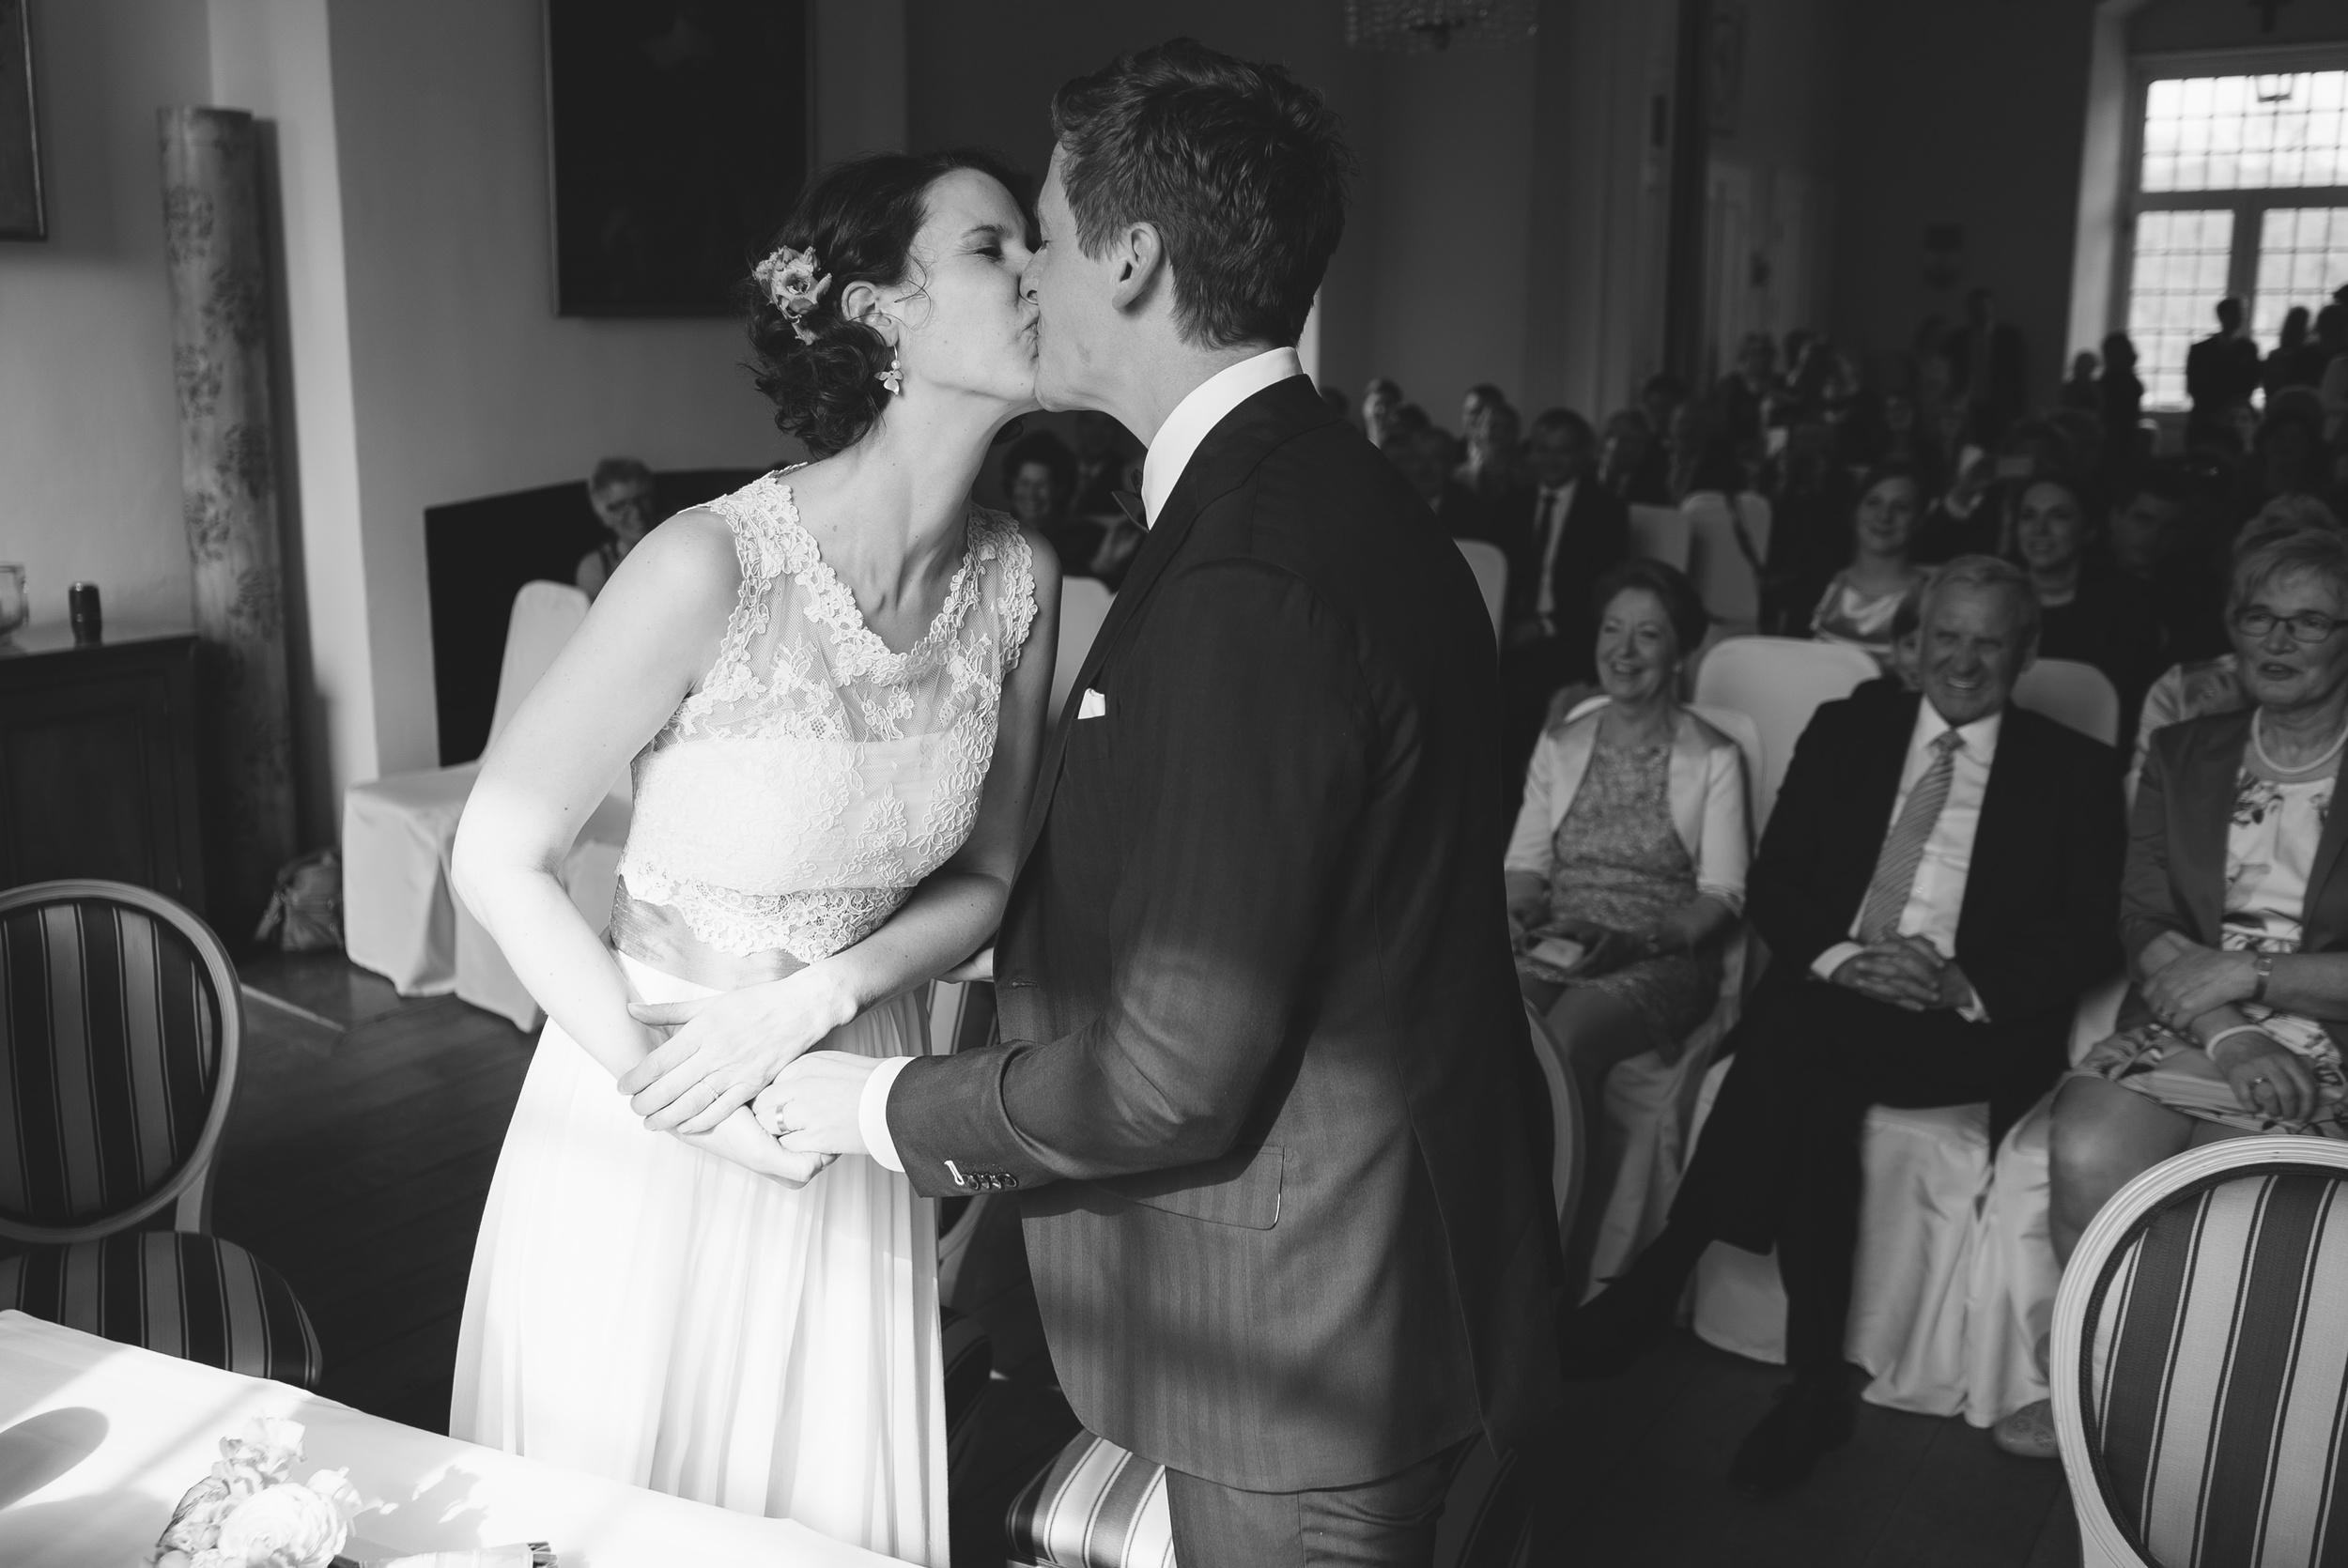 Hochzeitsfotograf-Schlossruine-Hertefeld-Weeze-080.jpg